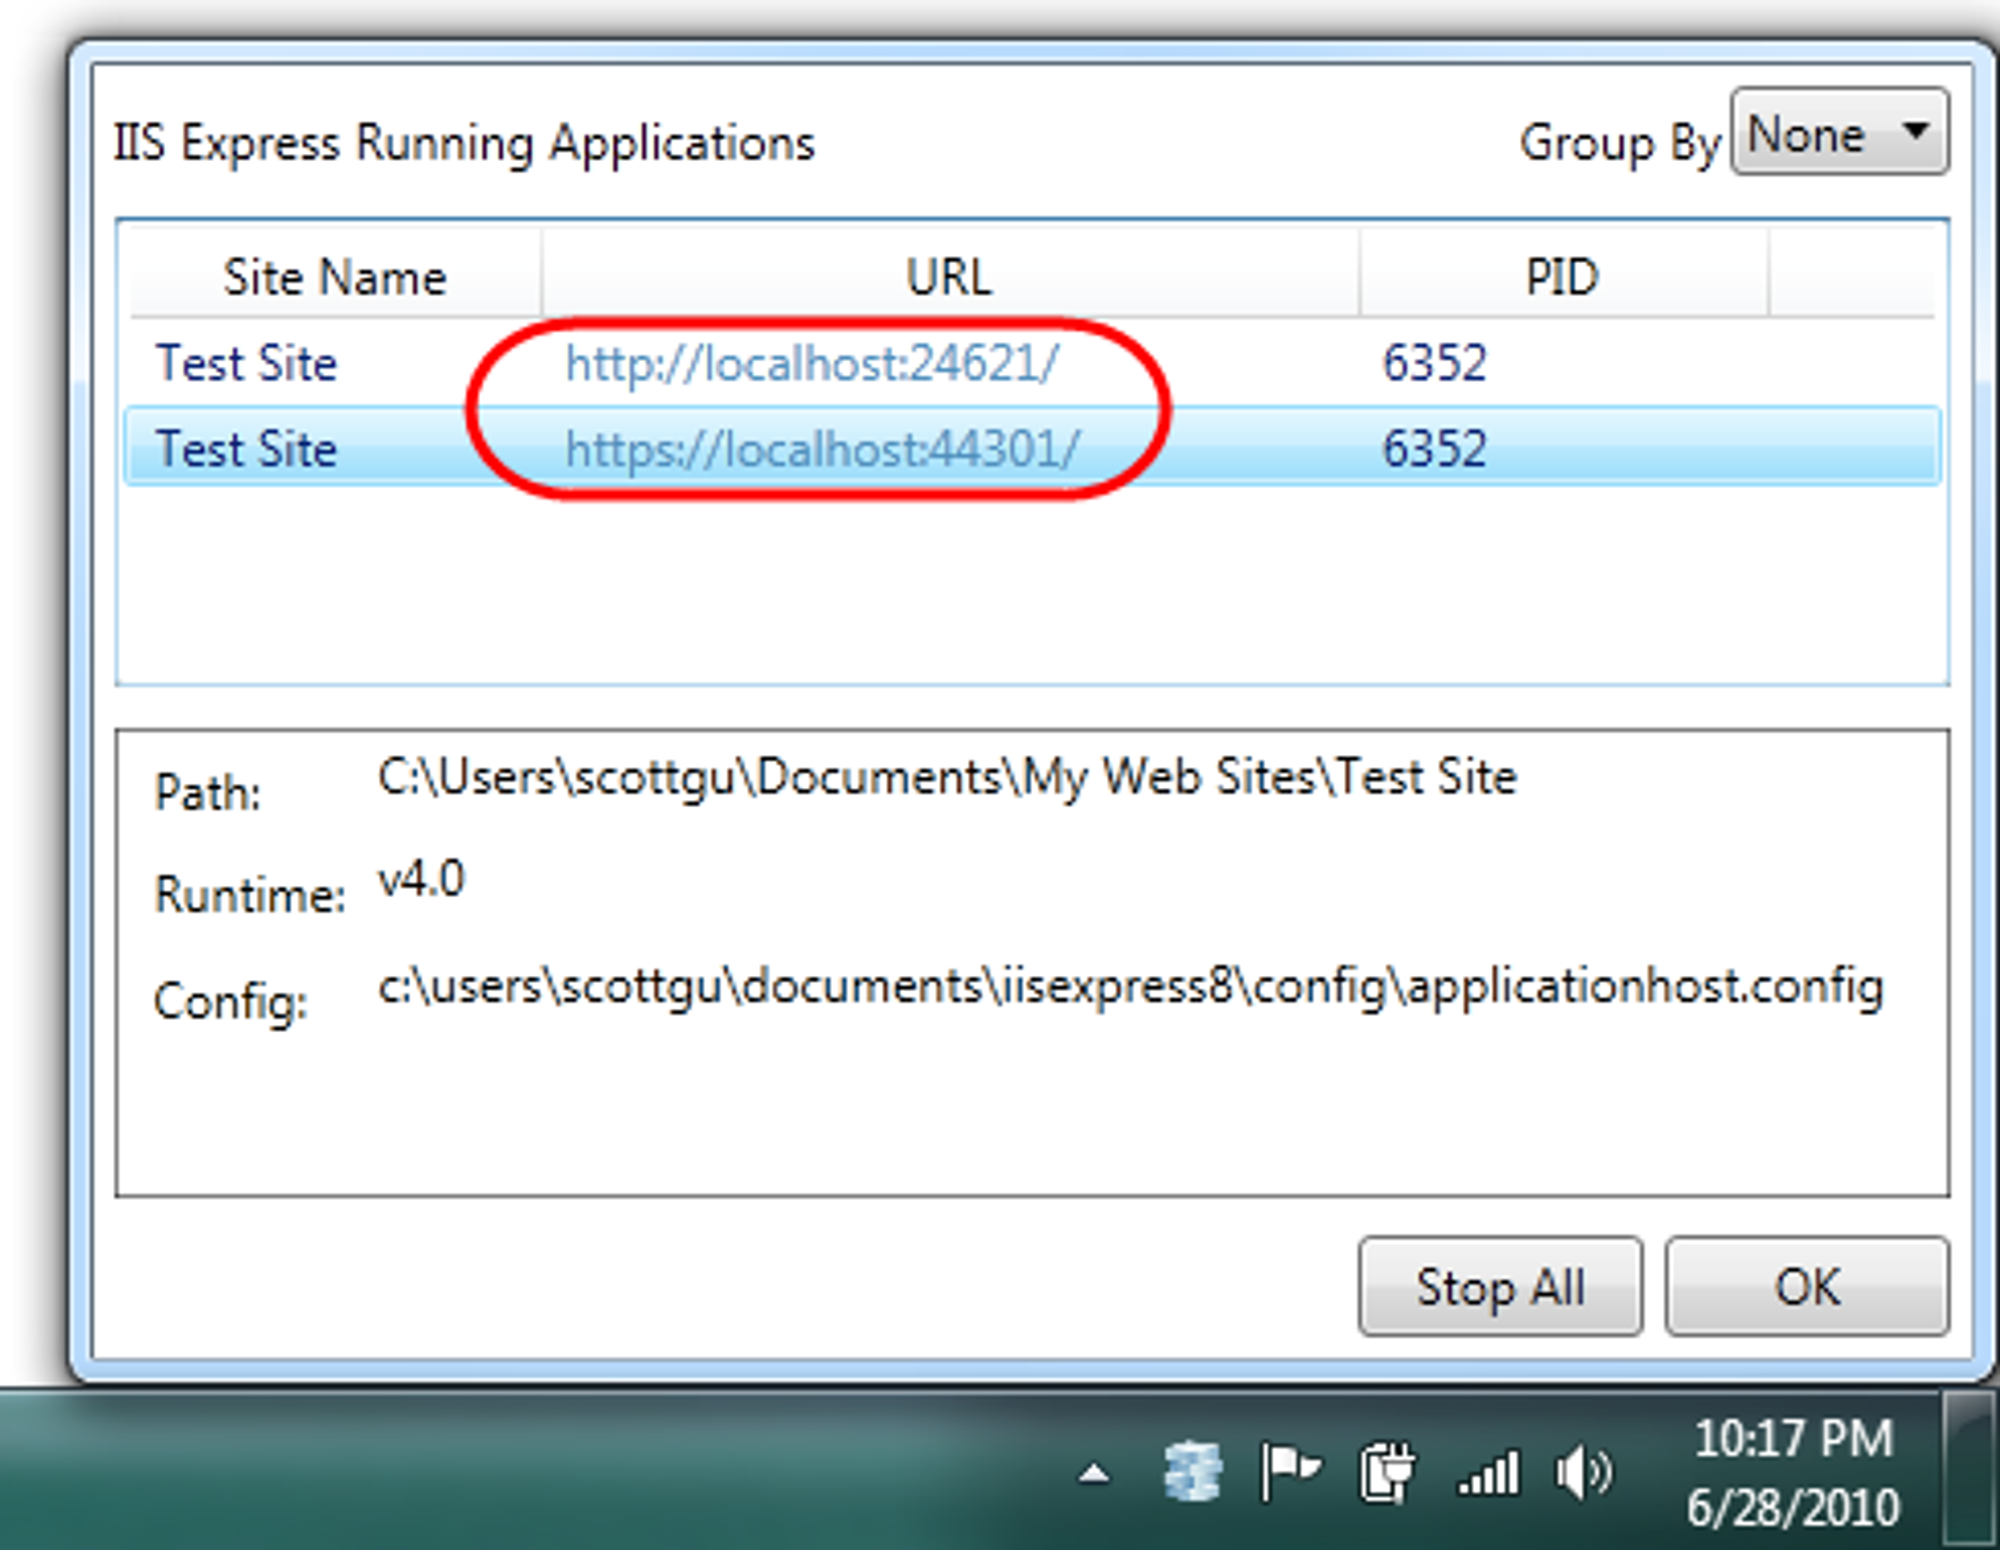 Statusvindu for Microsoft IIS Express